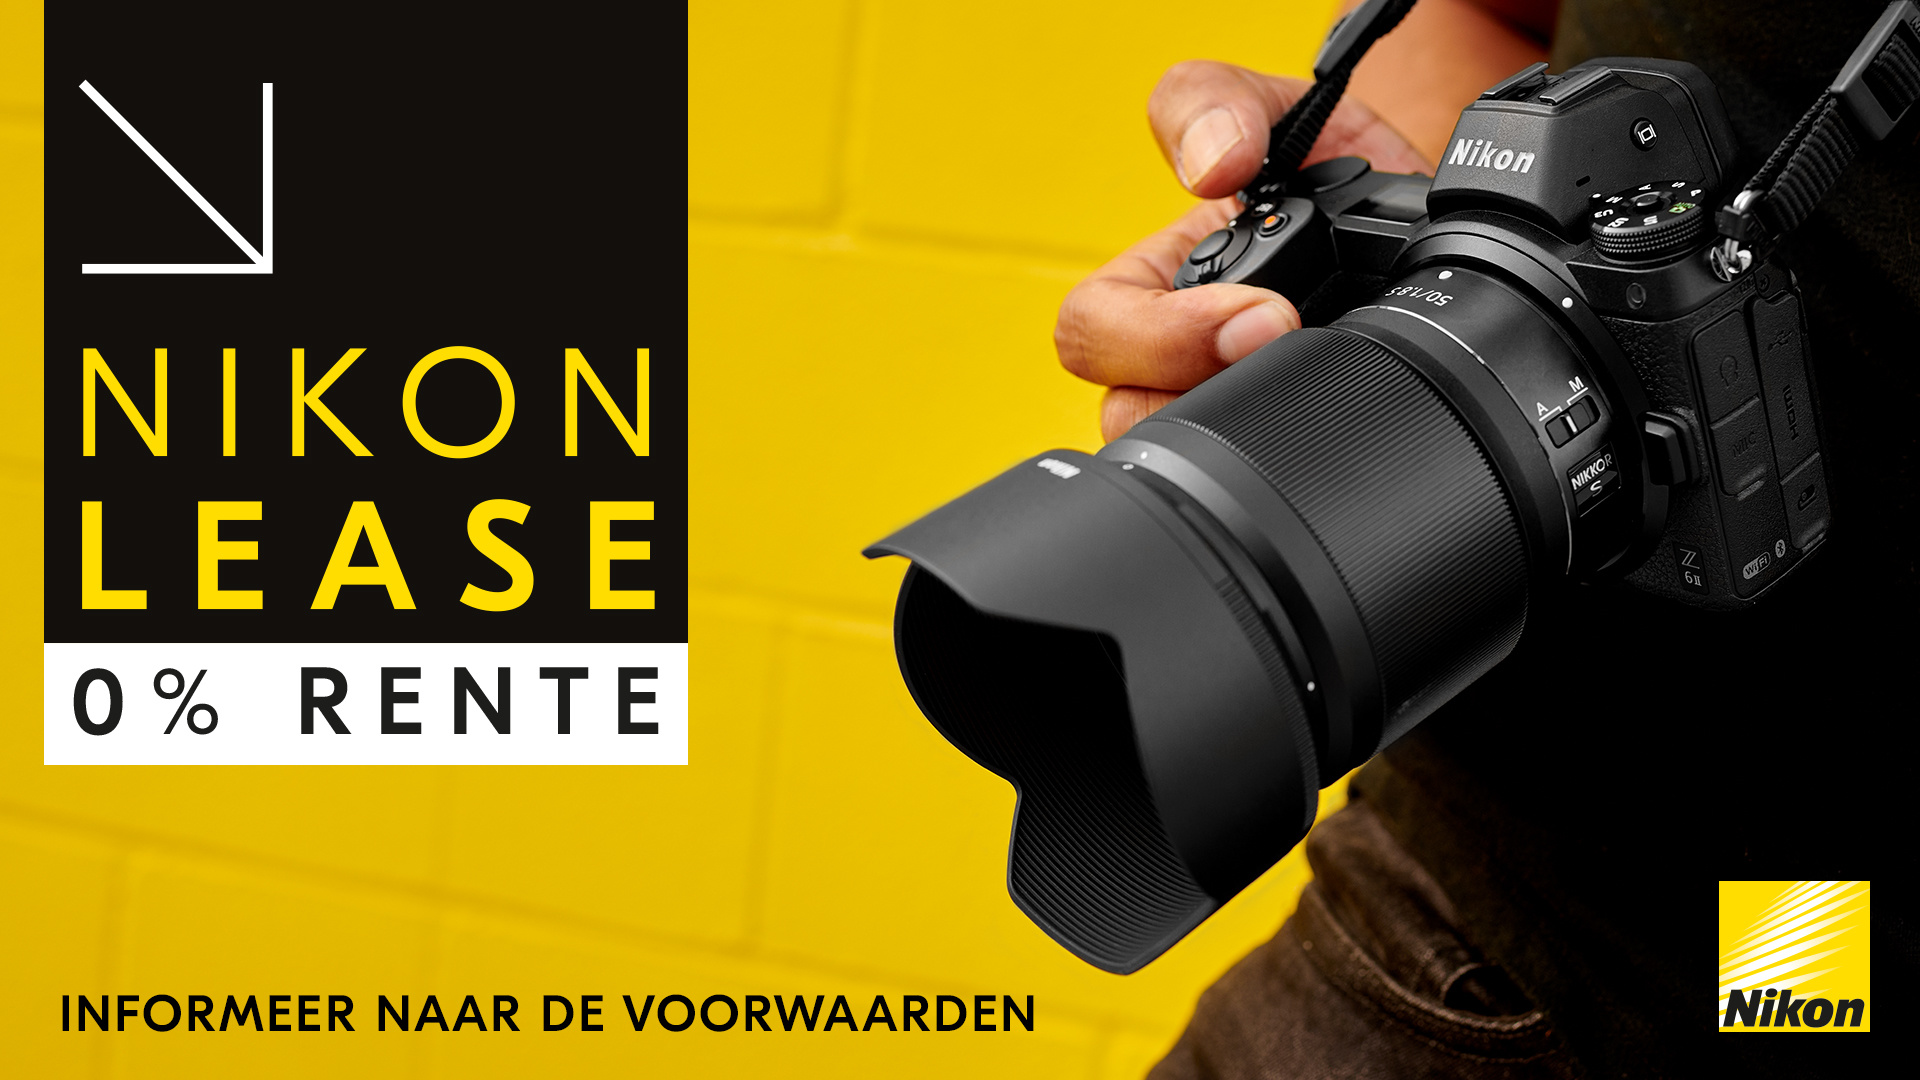 Nikon Leasing